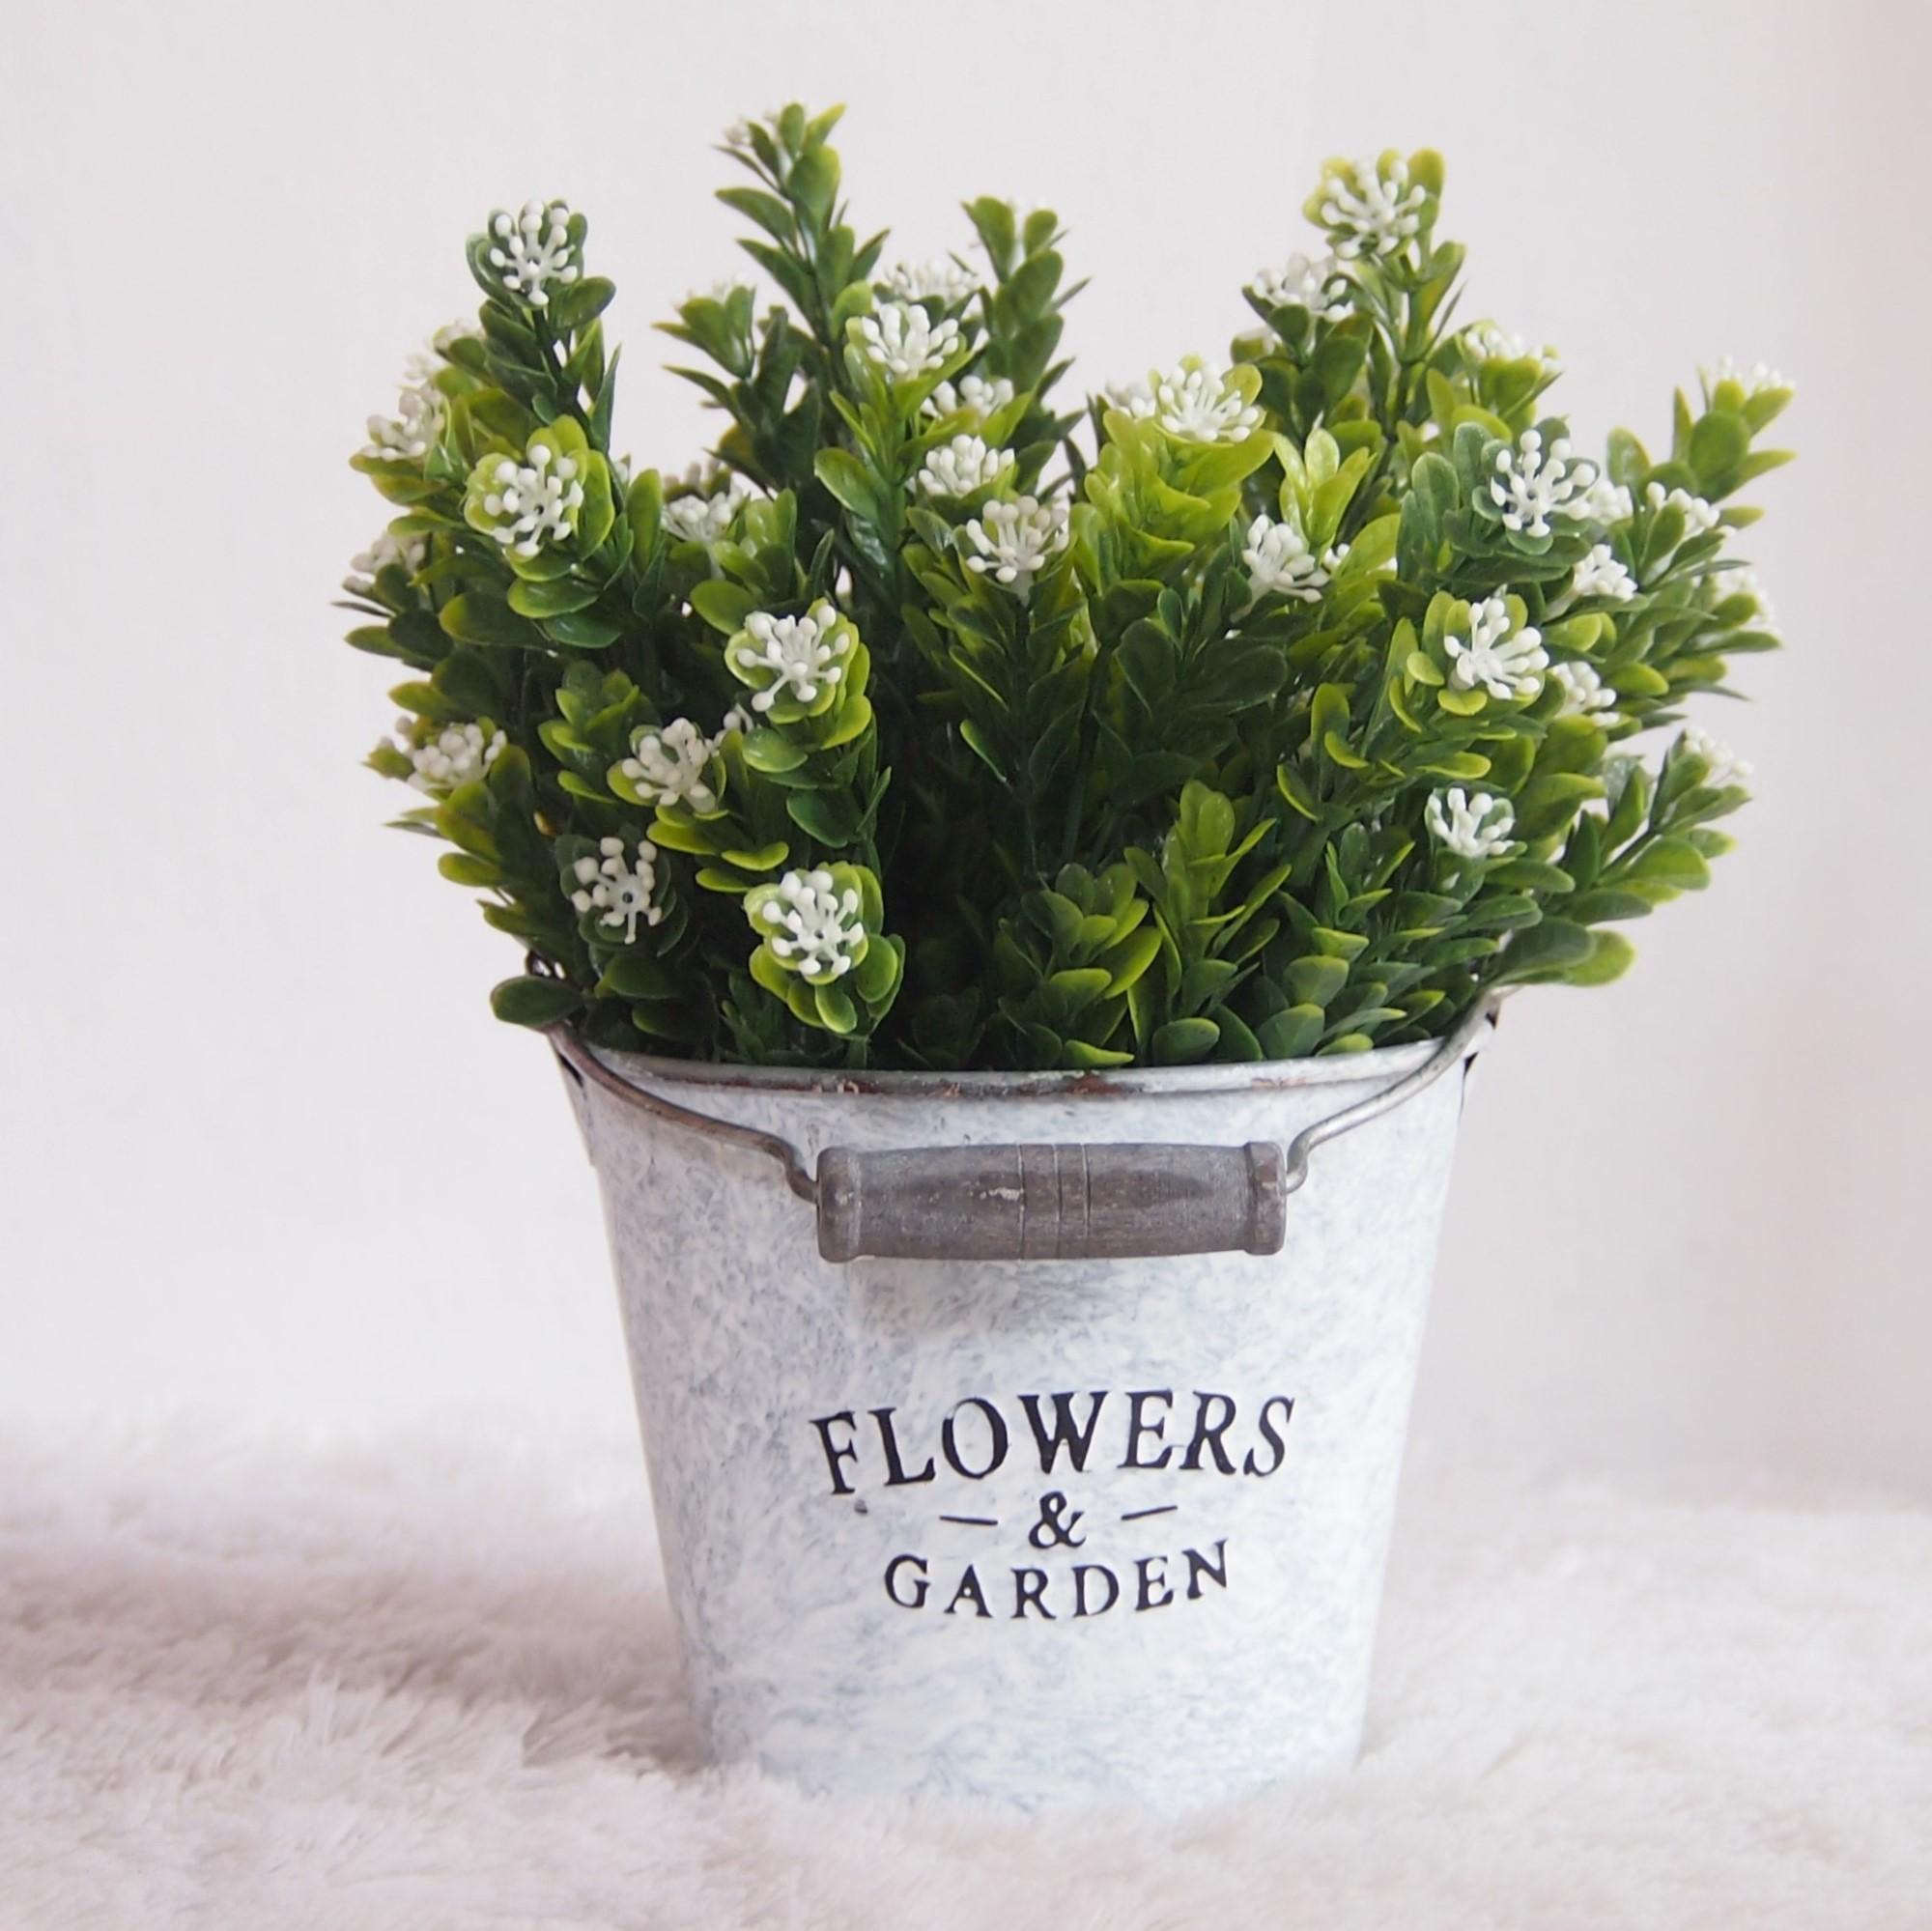 Bunga Hiasan Meja Dan Rumah - Bunga Pajangan Artifisial - Bunga Pucuk Putih Pot Kaleng TPK002